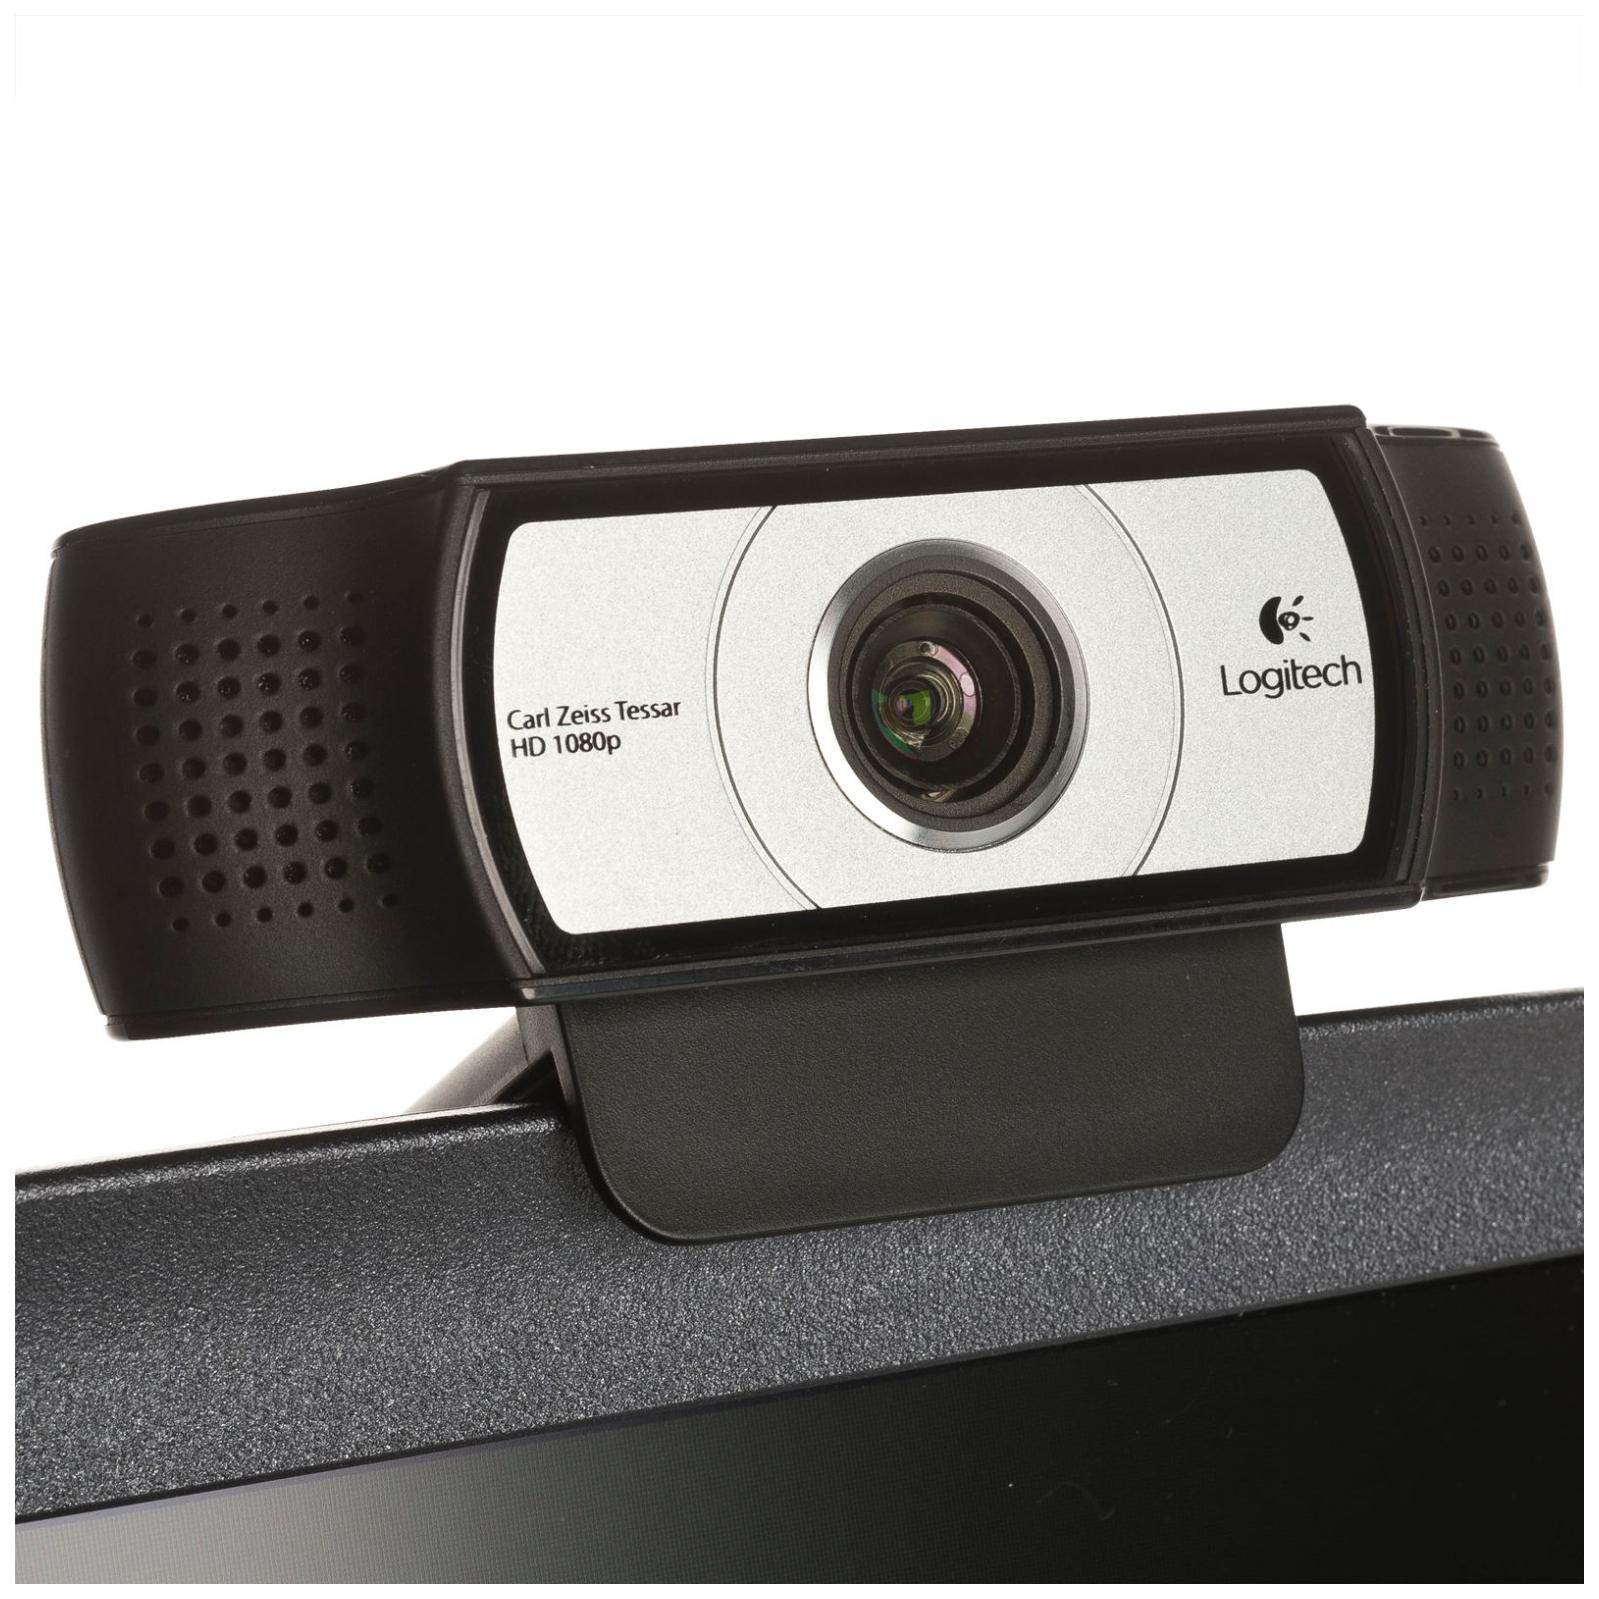 Logitech webcam c930e best buy